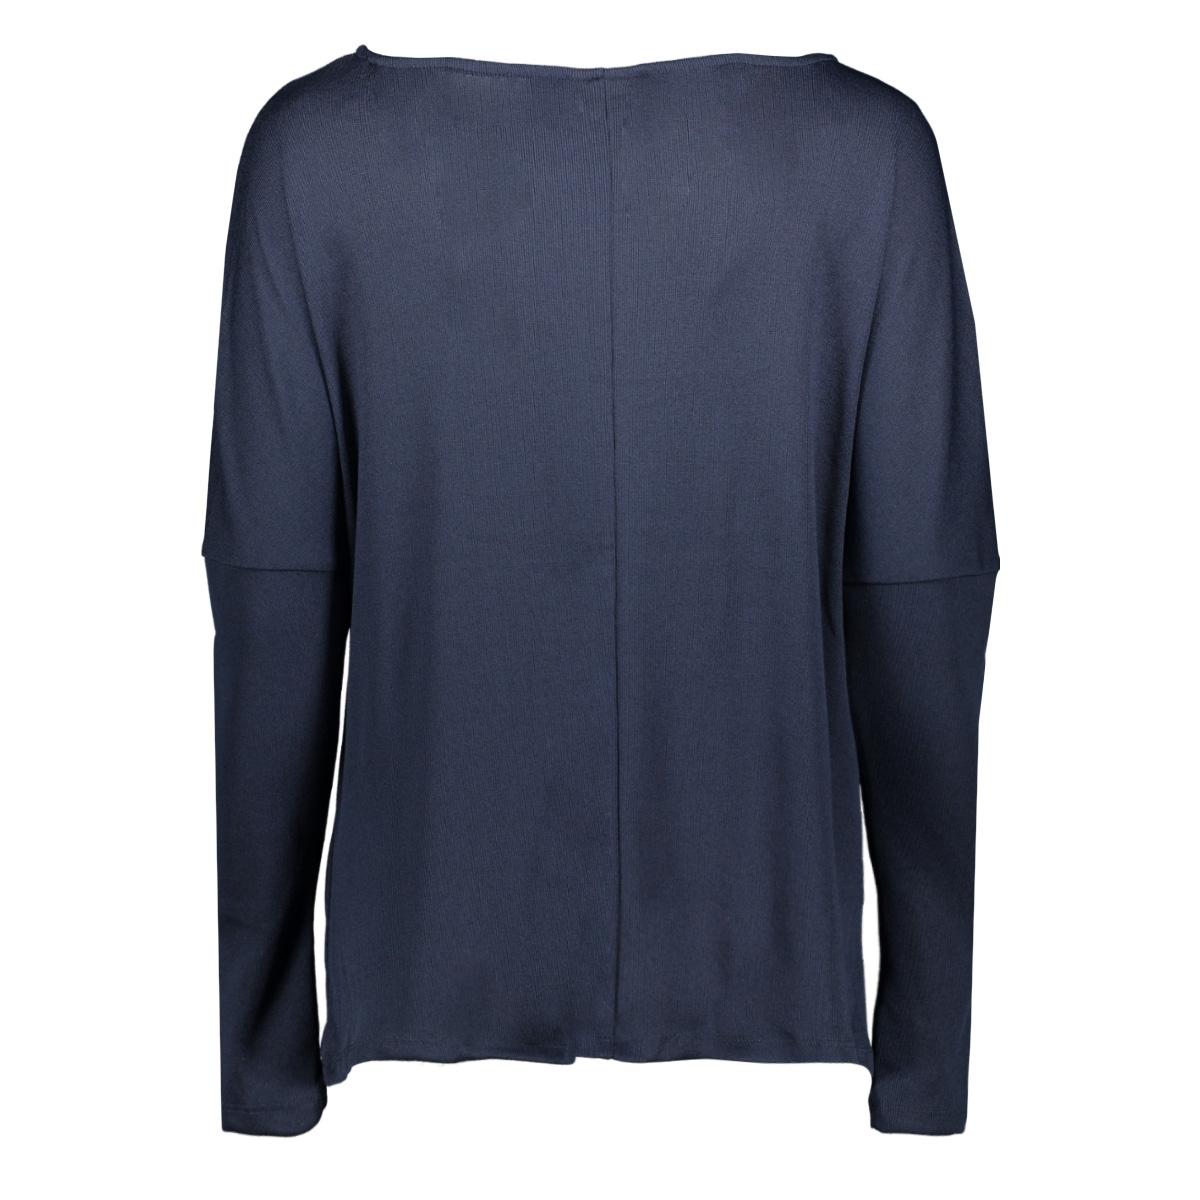 vinamina l/s t-shirt/1 14058747 vila trui navy blazer